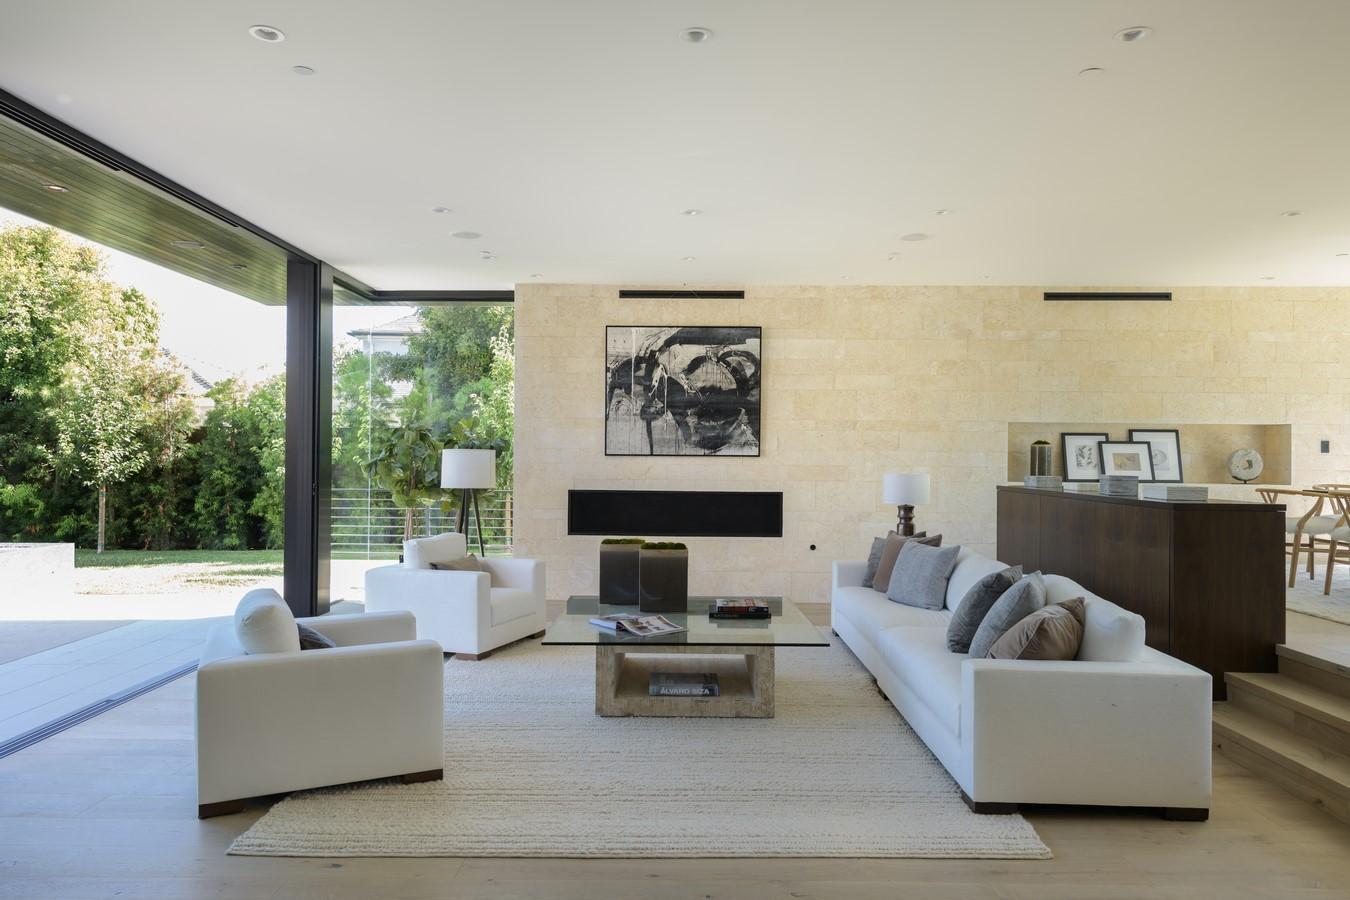 Amalfi Drive Residen By Michael Lee Architects - Sheet1